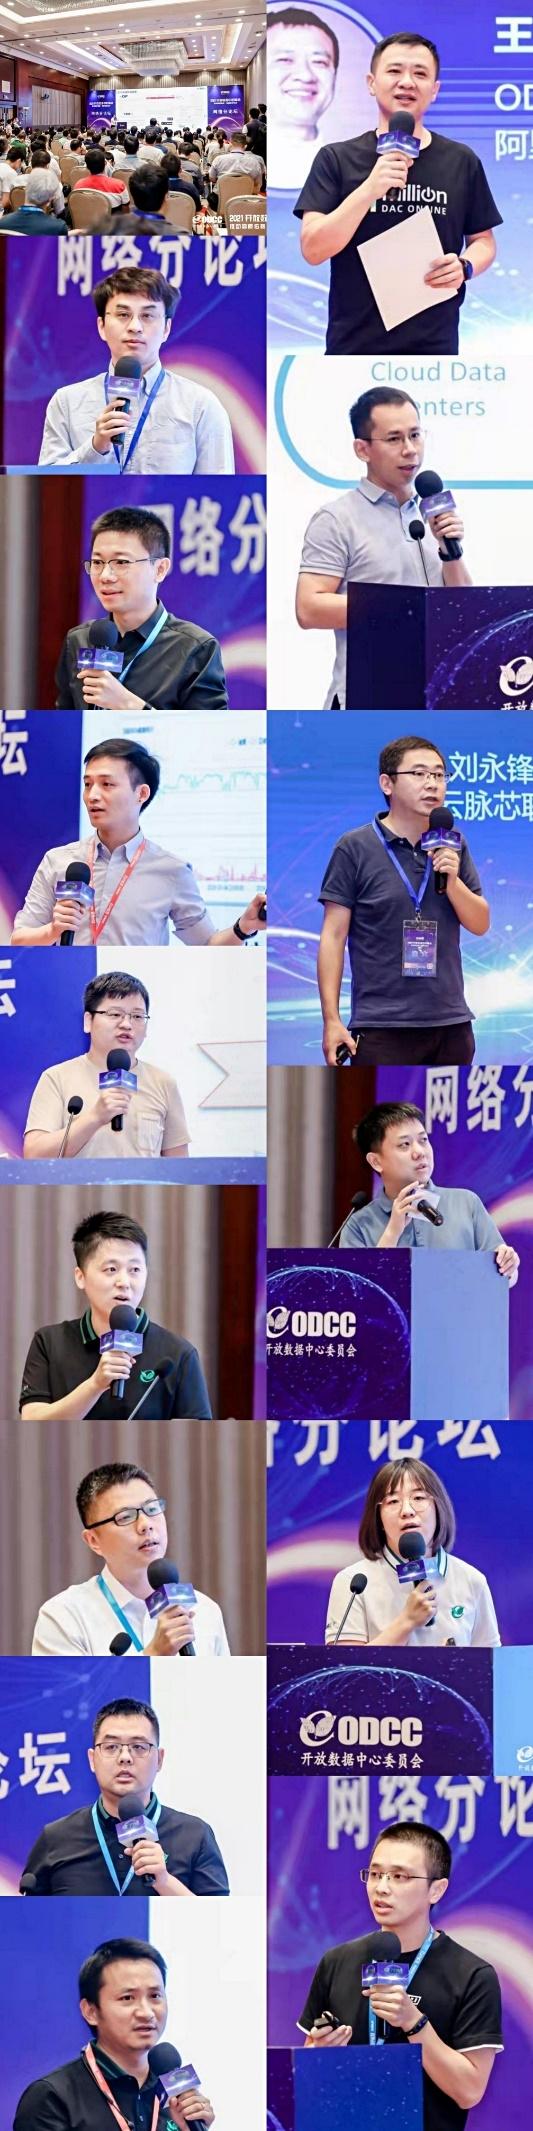 ODCC 2021开放数据中心峰会之网络分论坛